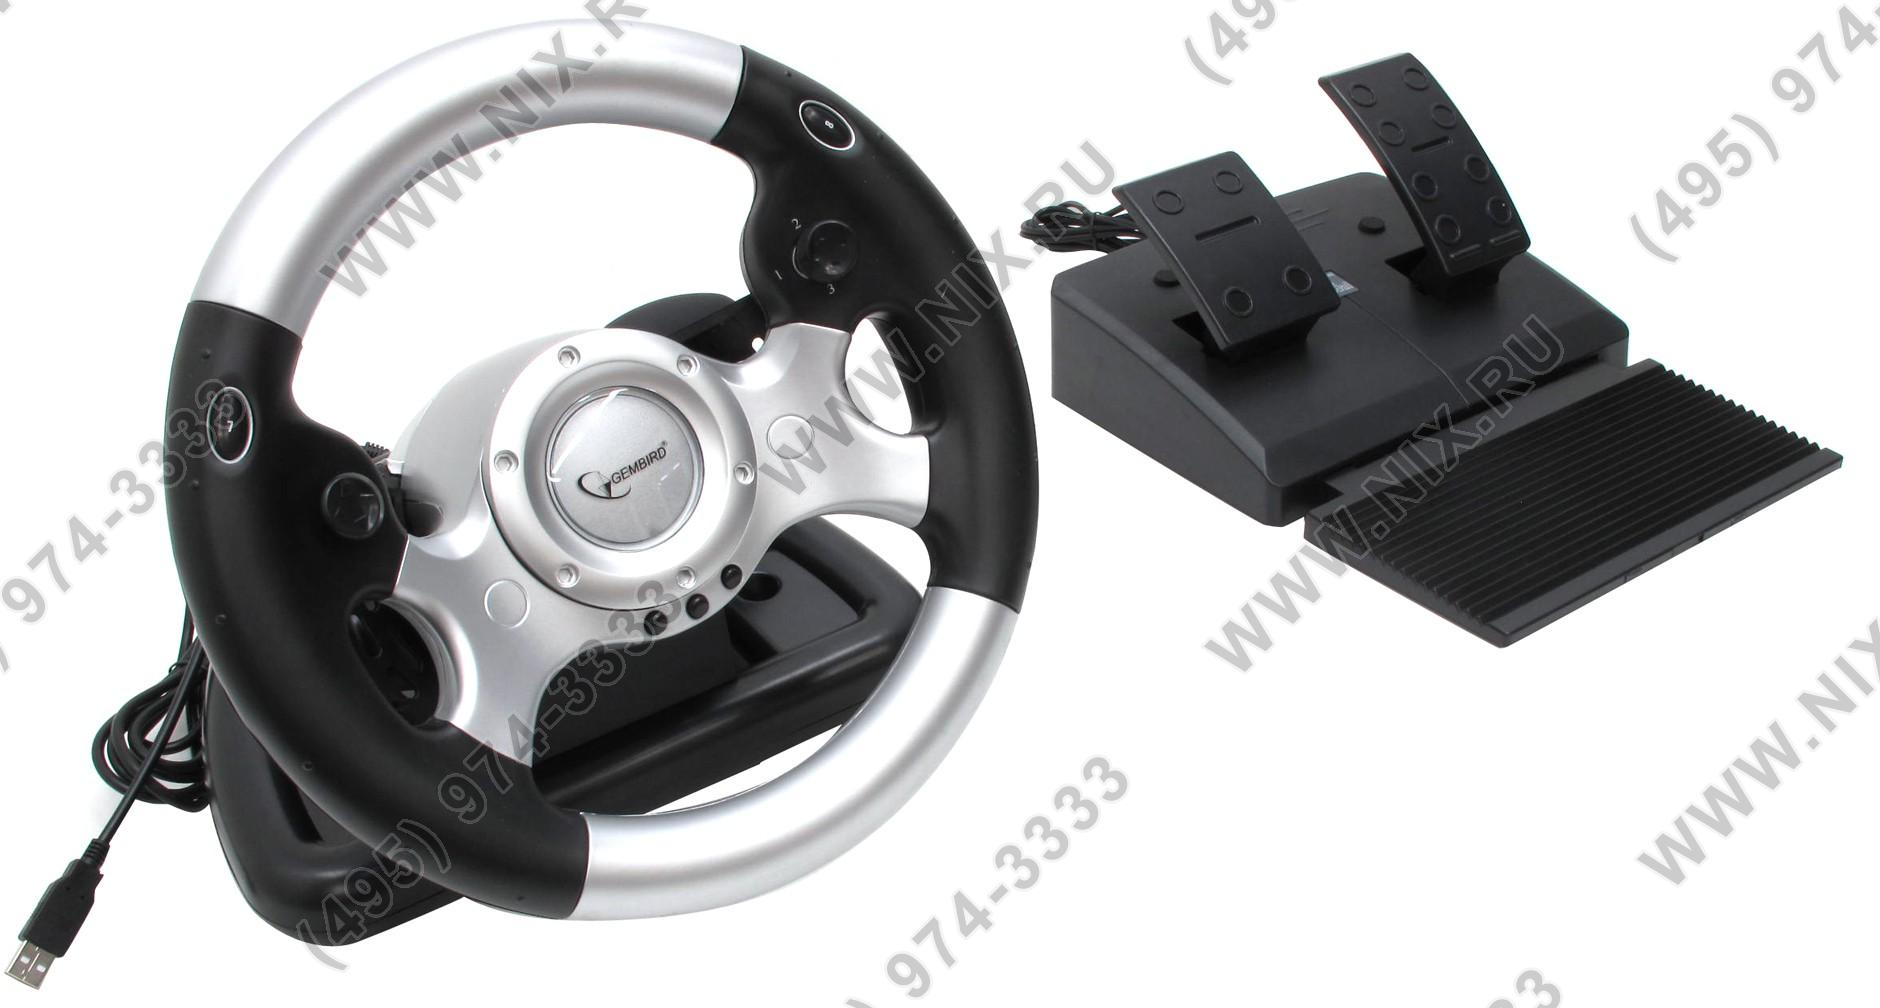 Драйвер на Руль Gembird Force Feedback STR-FFB2 USB (Рулевое колесо+педали+рычаг перекл.скор, 2x4поз.перекл.,9кн.)